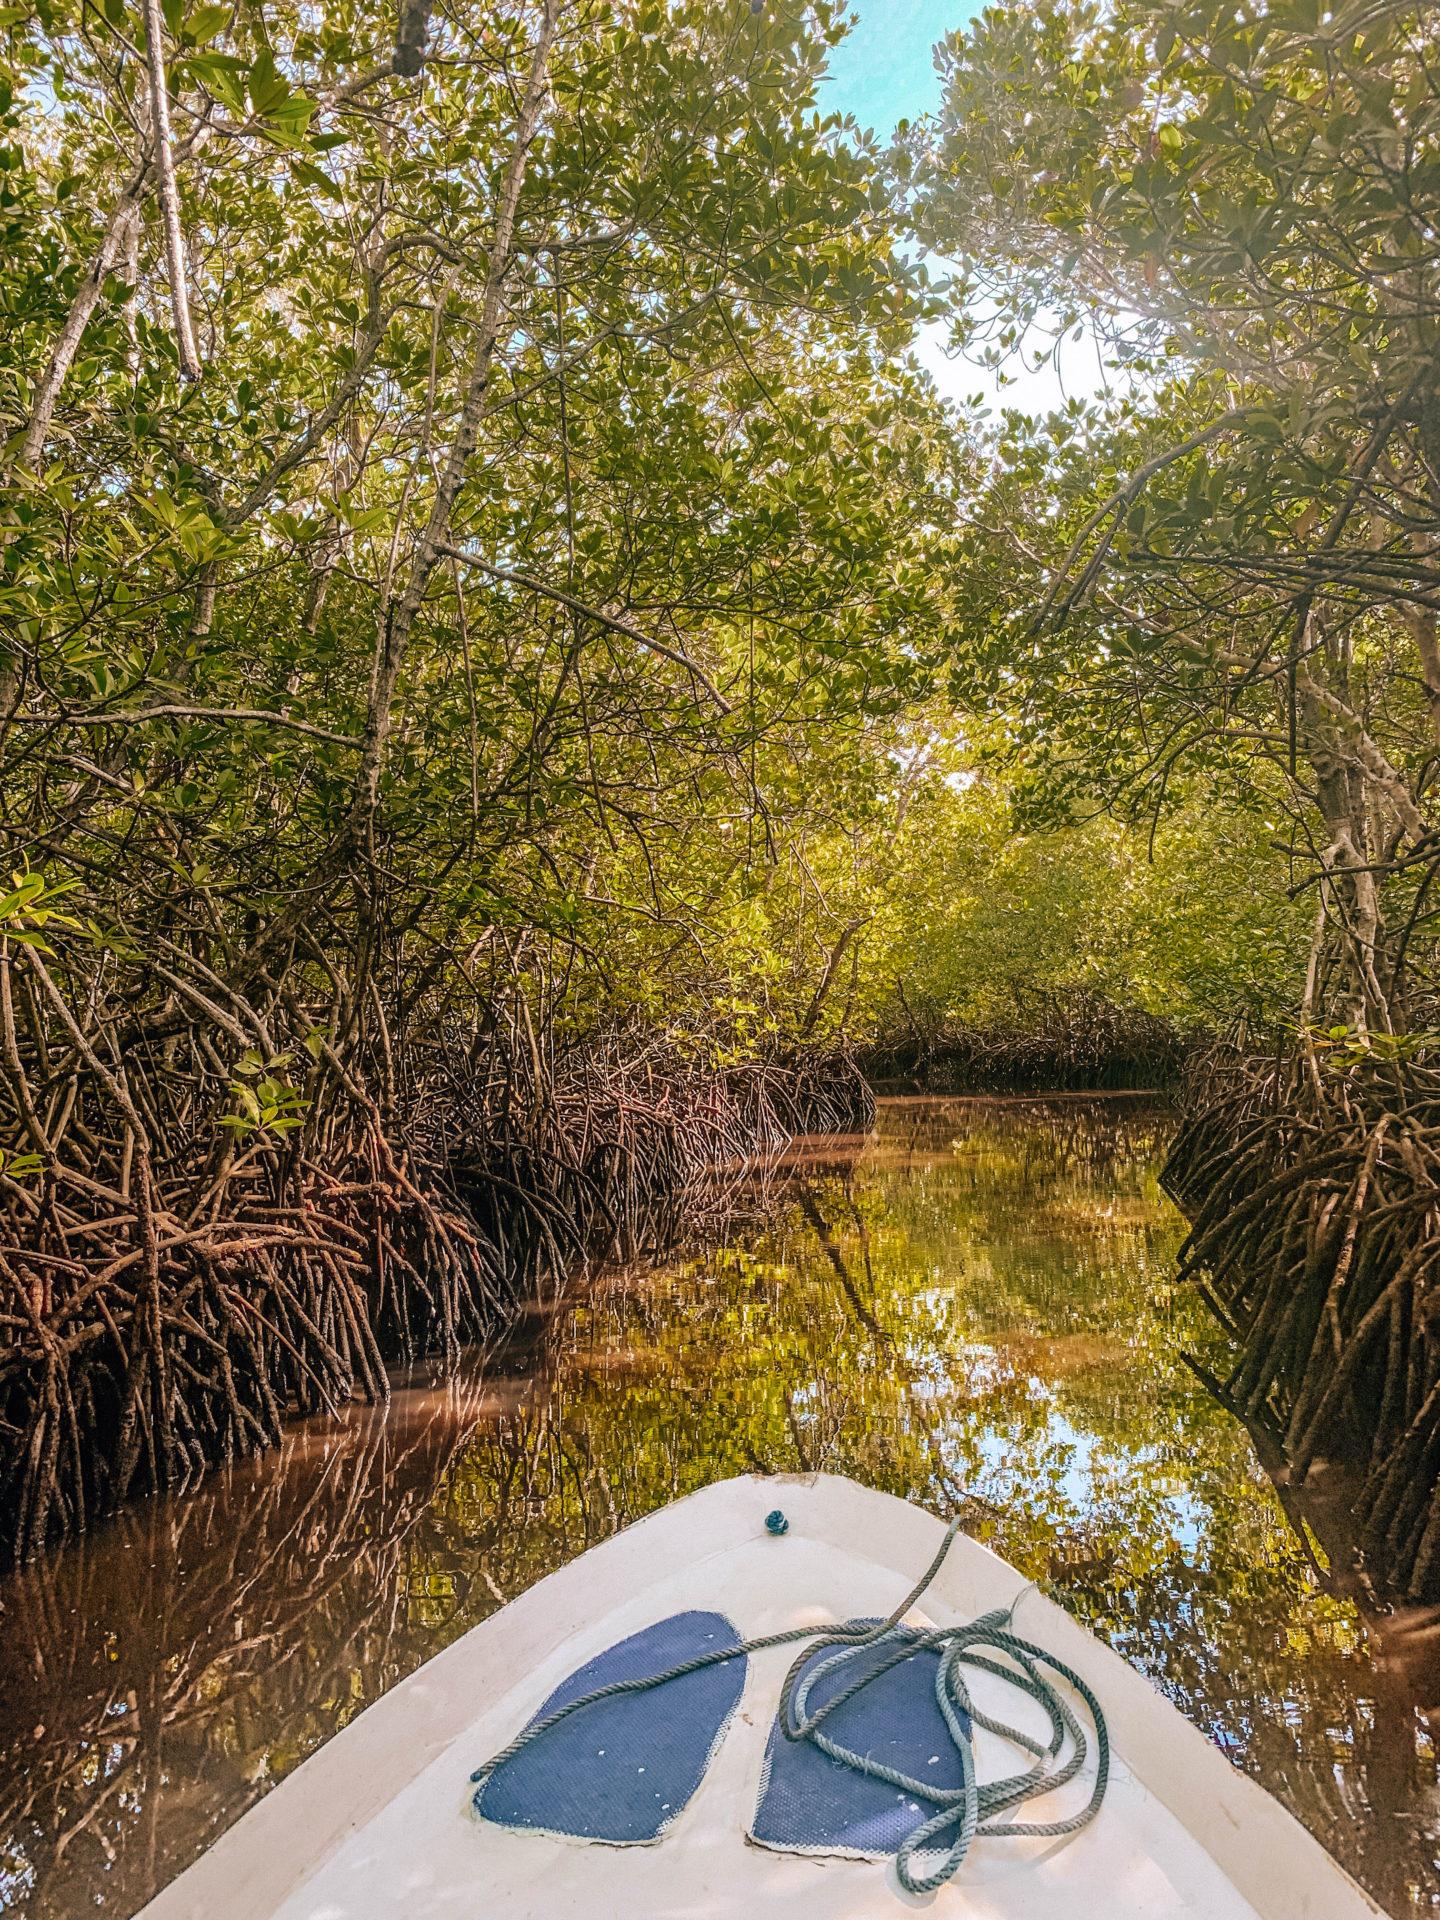 mangrove tour mangrove trees bali nusa penida nusa lembongan tour vacation brunettie